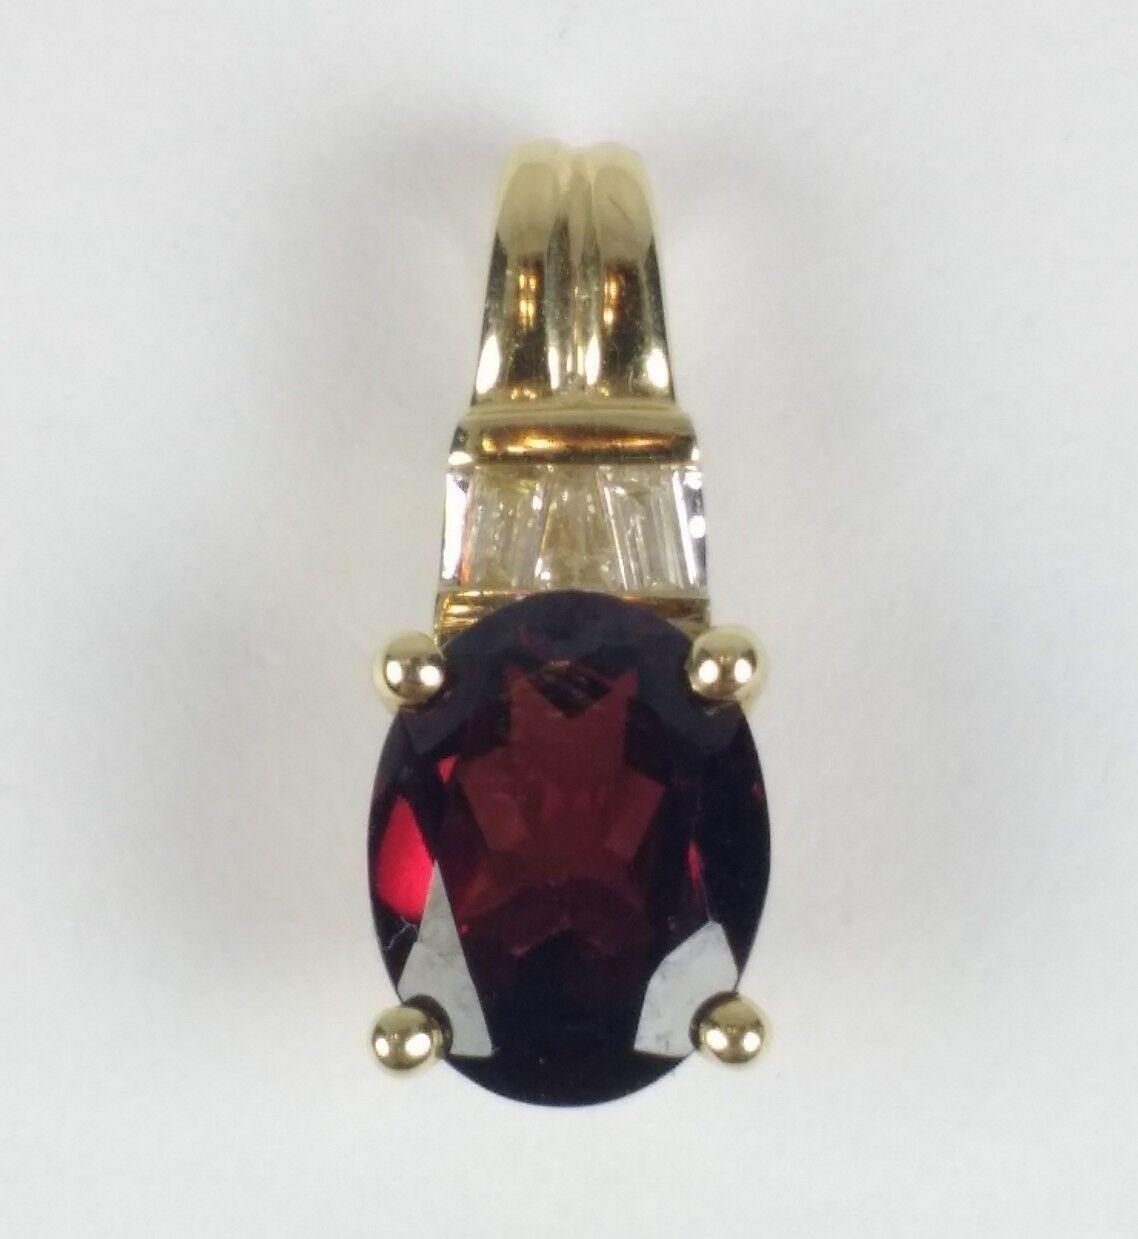 14K Yellow gold Oval Garnet Diamond Accents Slide Pendant 1.87 gm